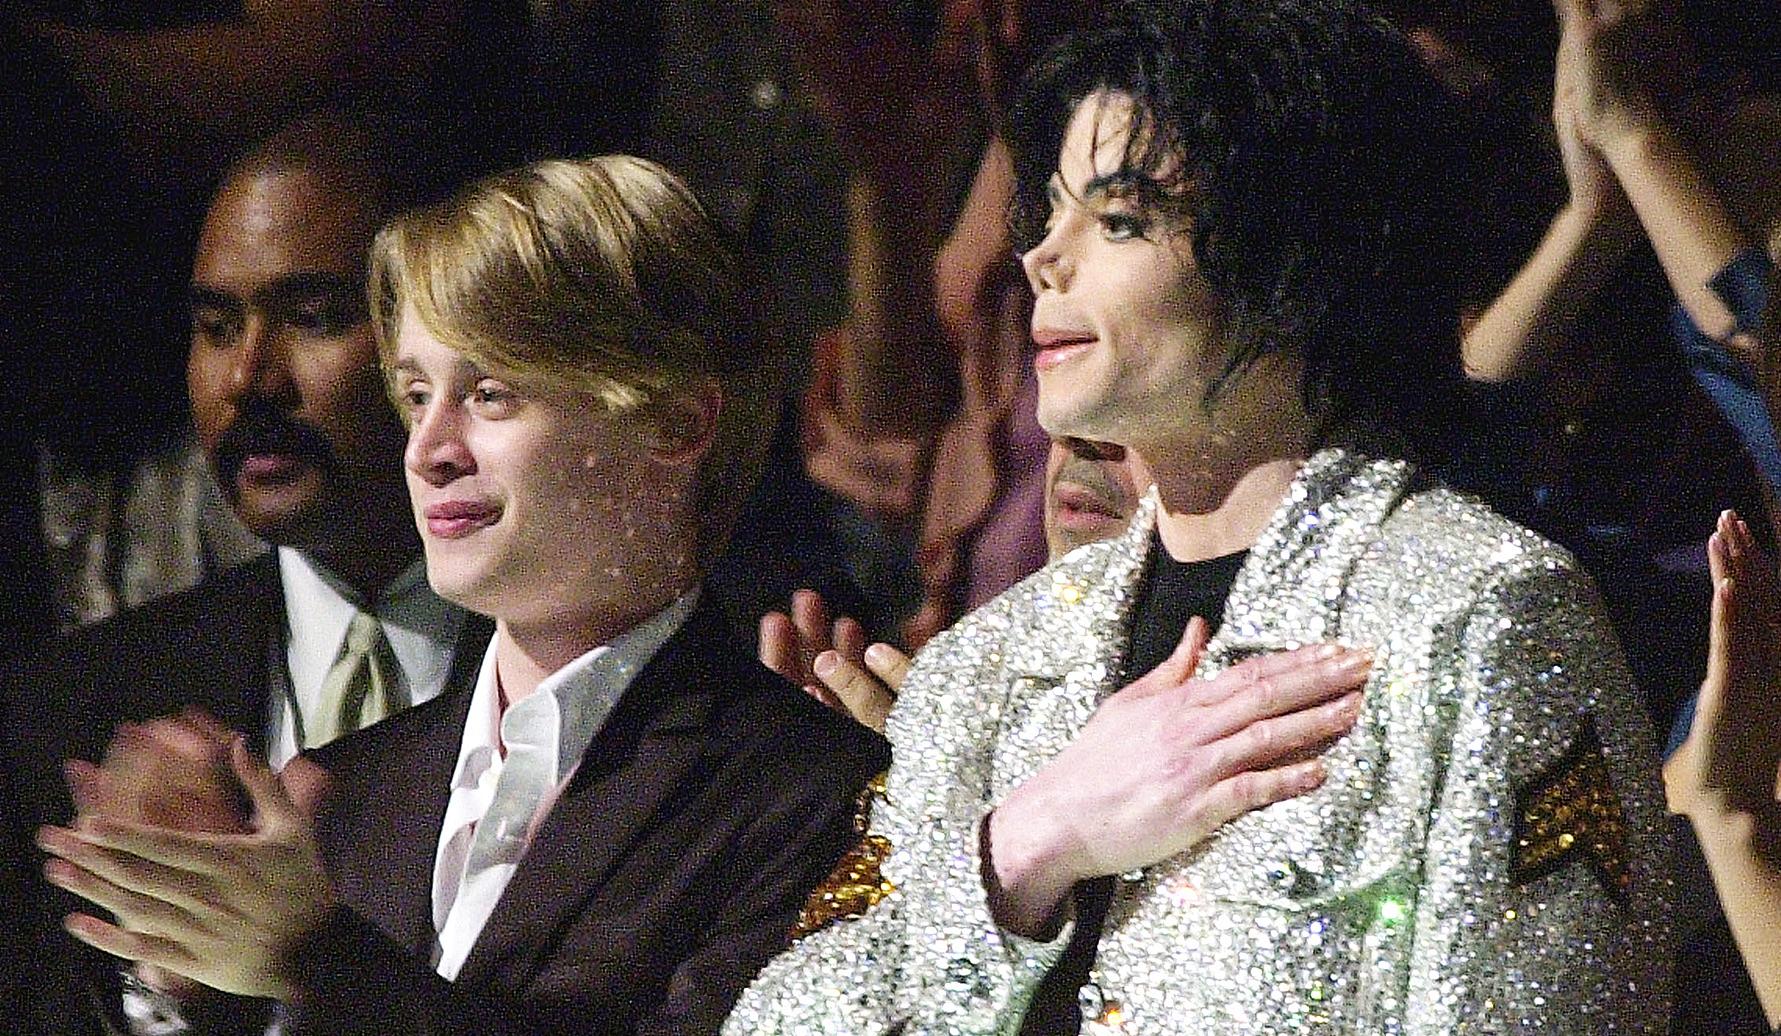 Macaualay Culkin Michael Jackson